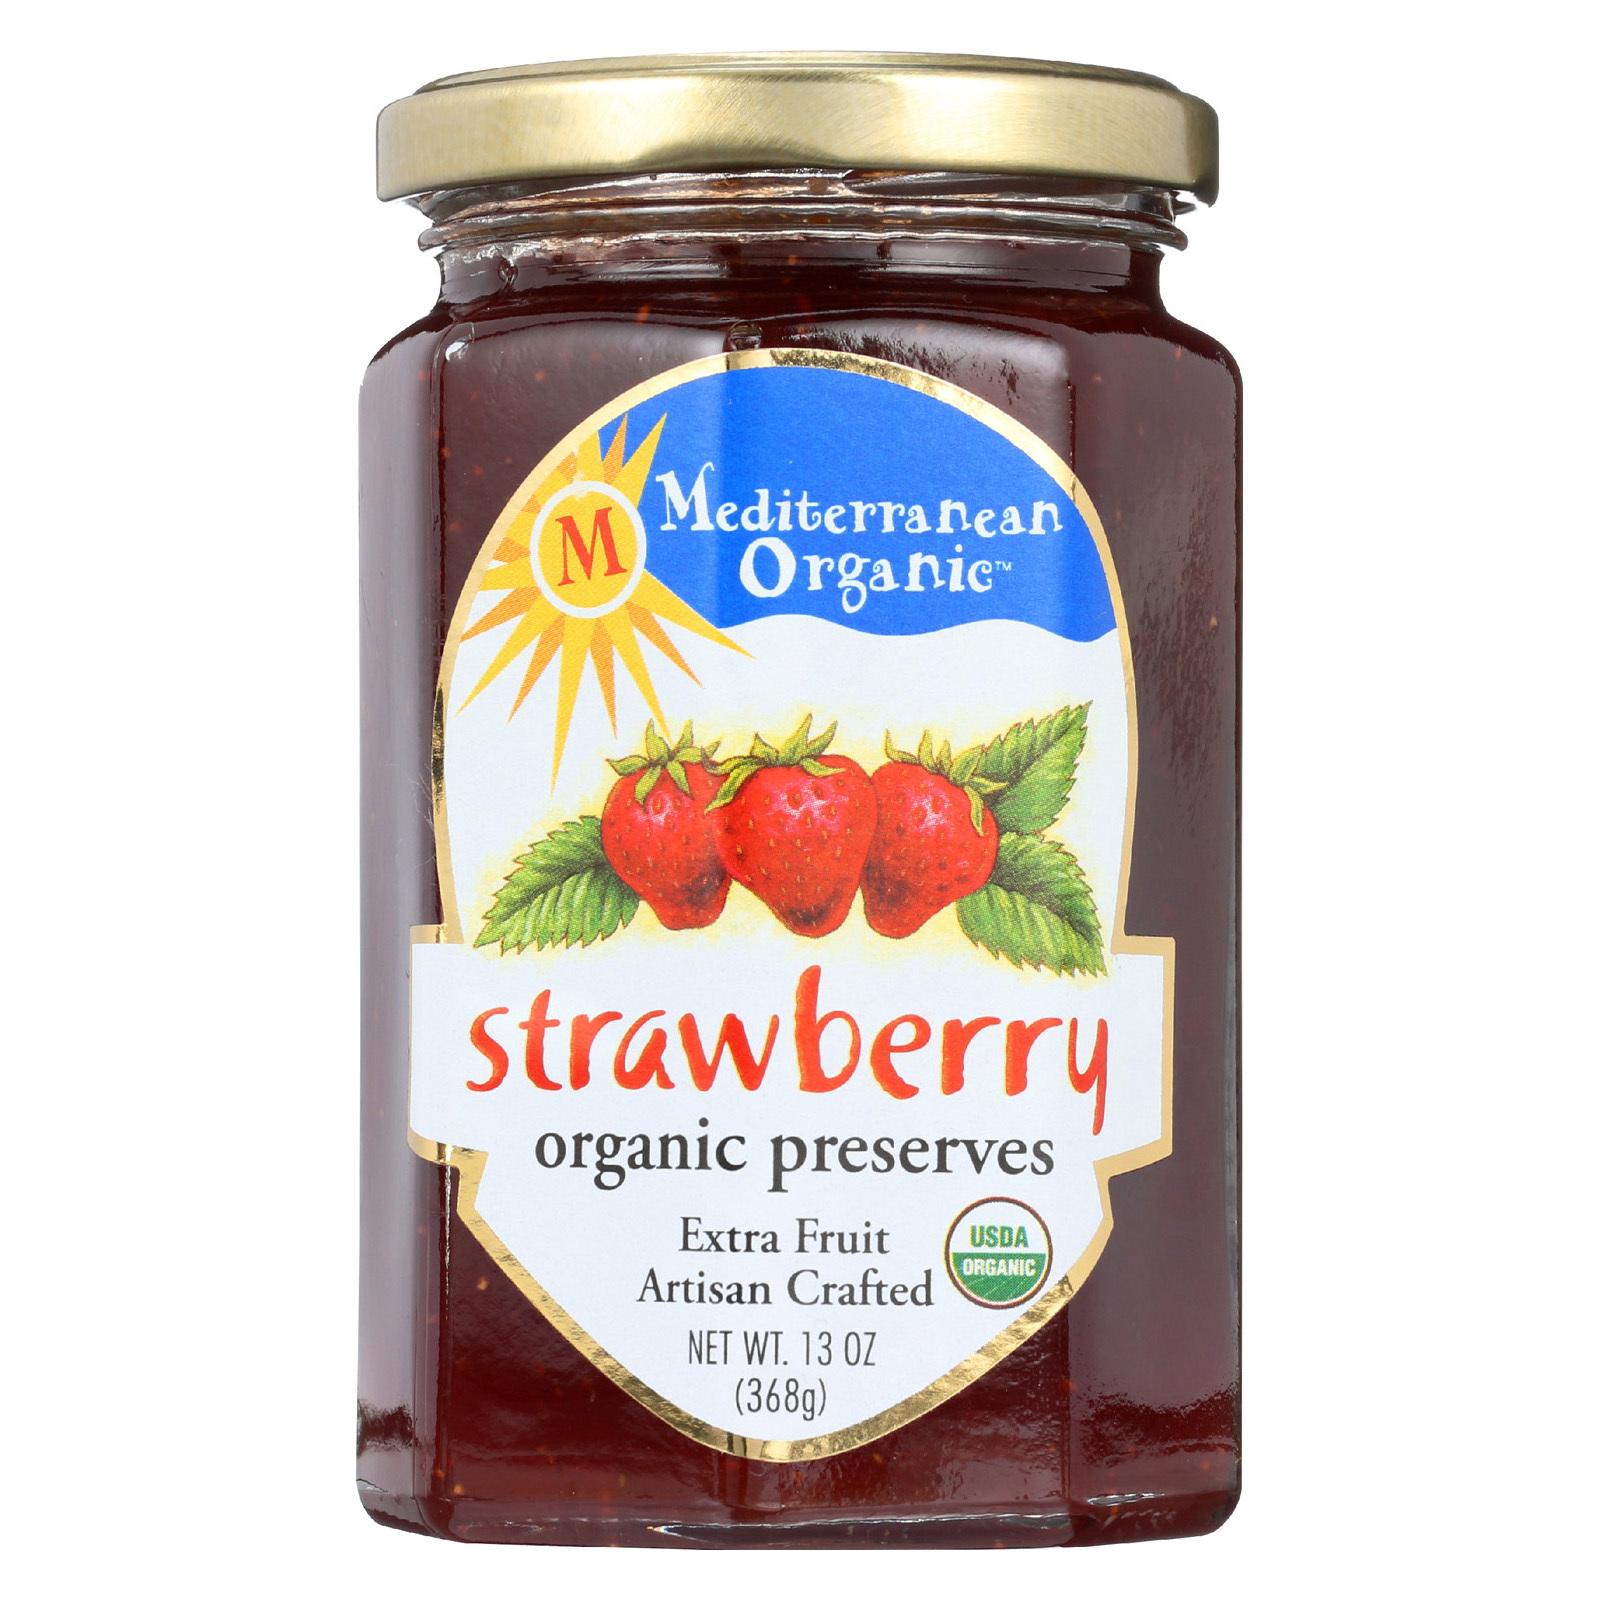 Mediterranean Organic Organic Preserves - Strawberry - 13 oz